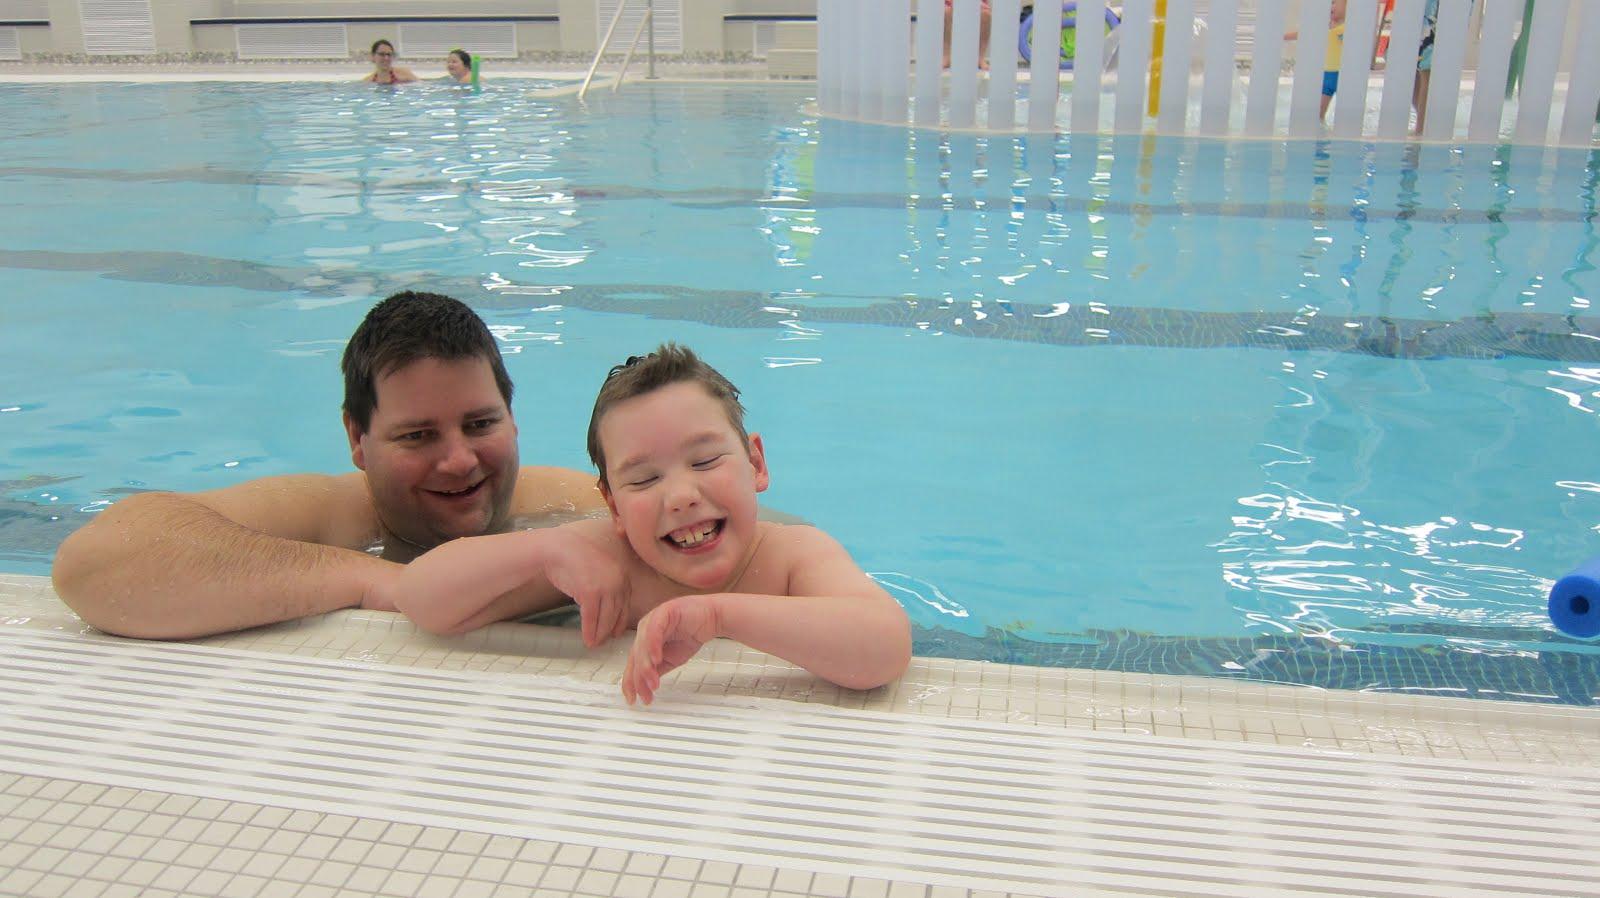 Cameron jackson swimming pool